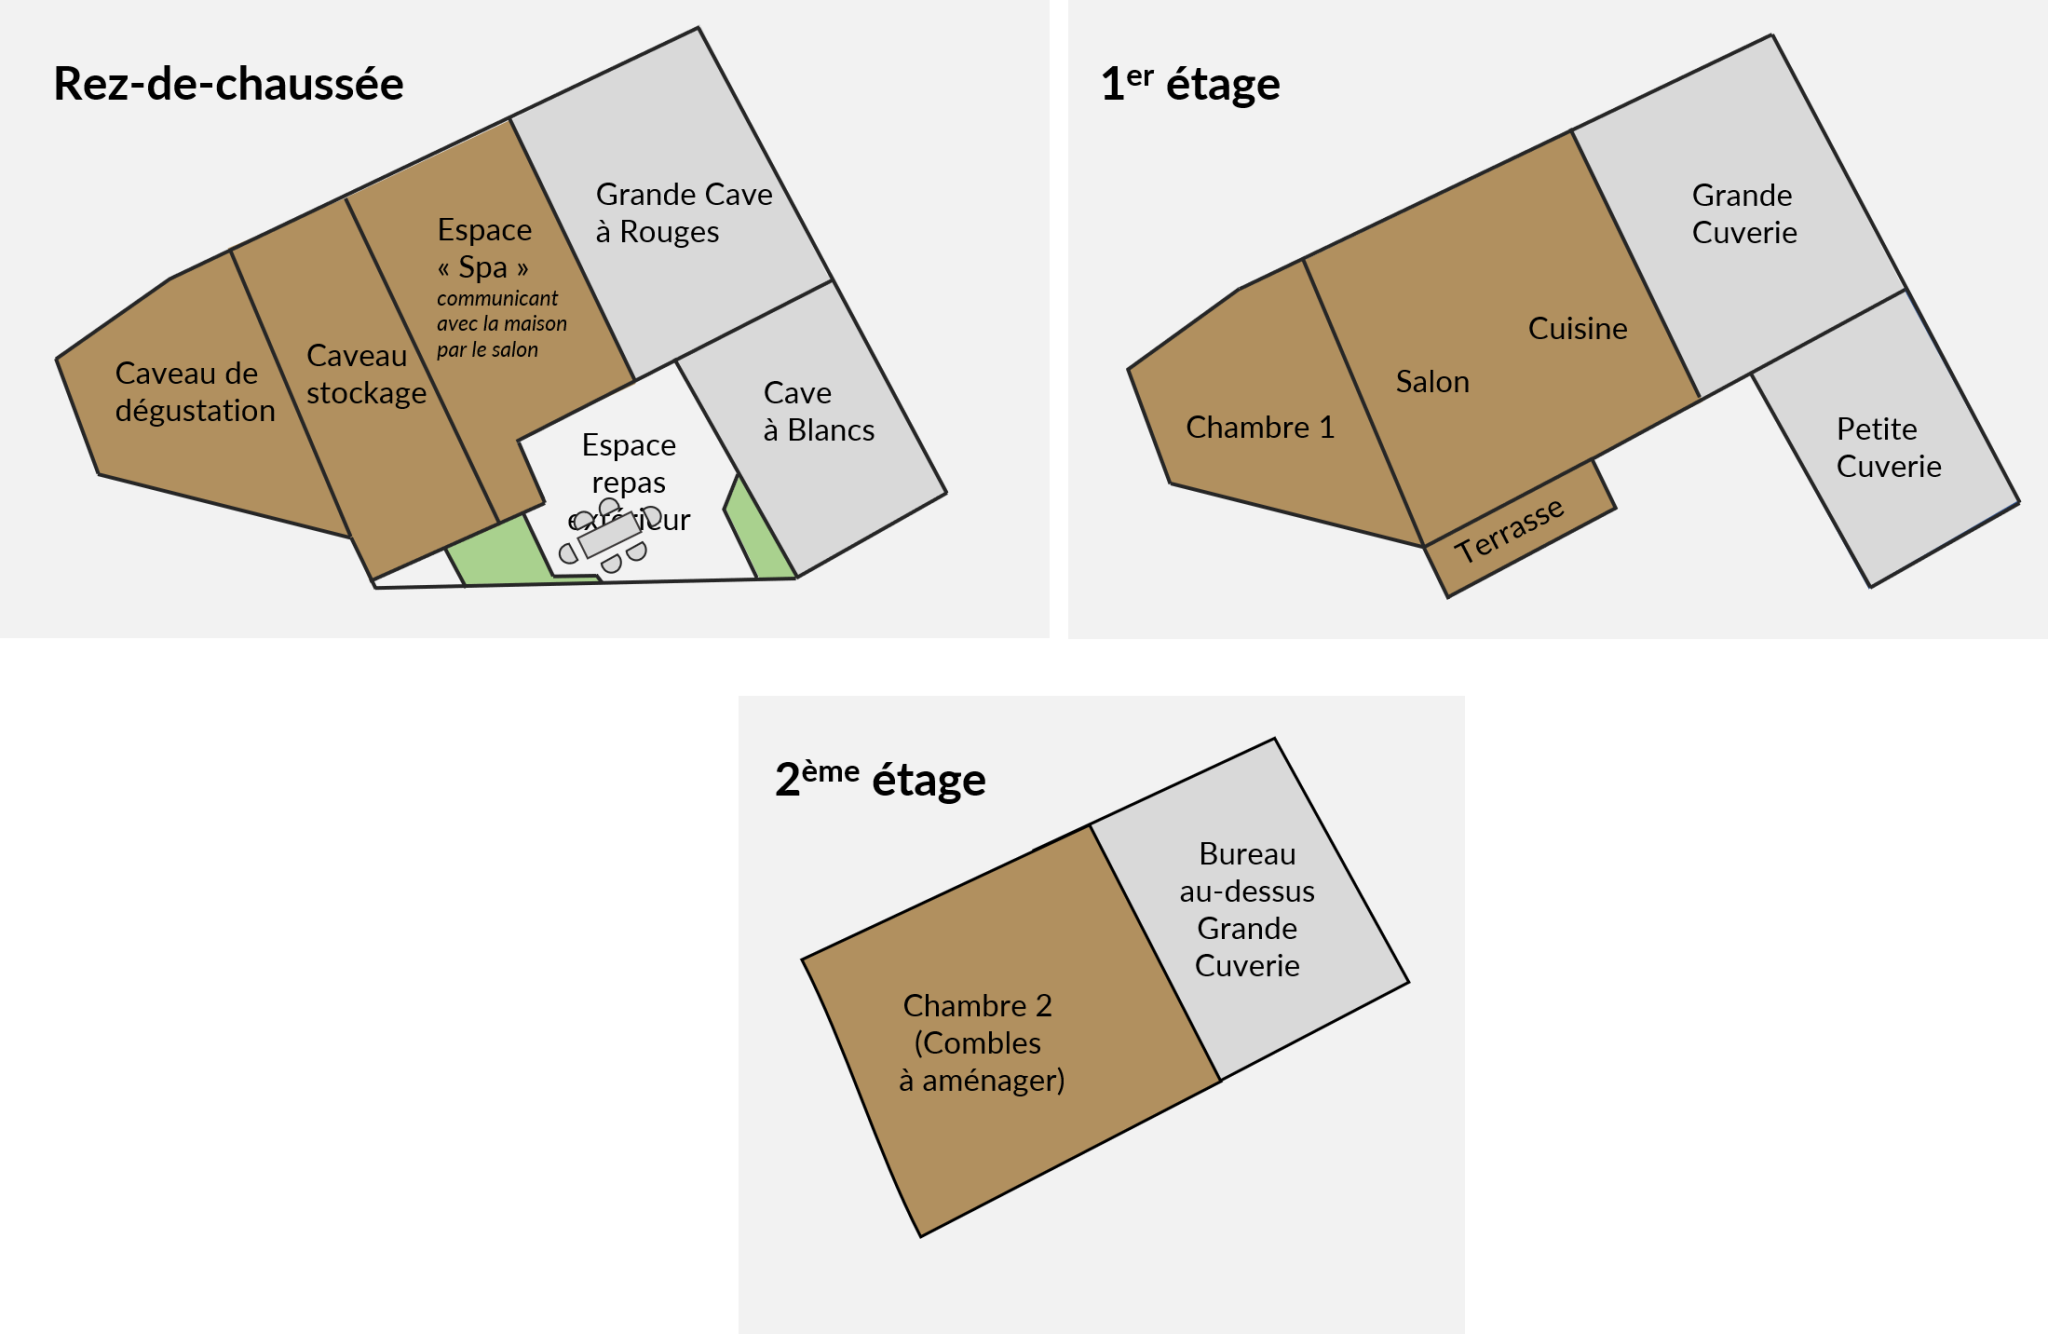 Etage 1 et 2